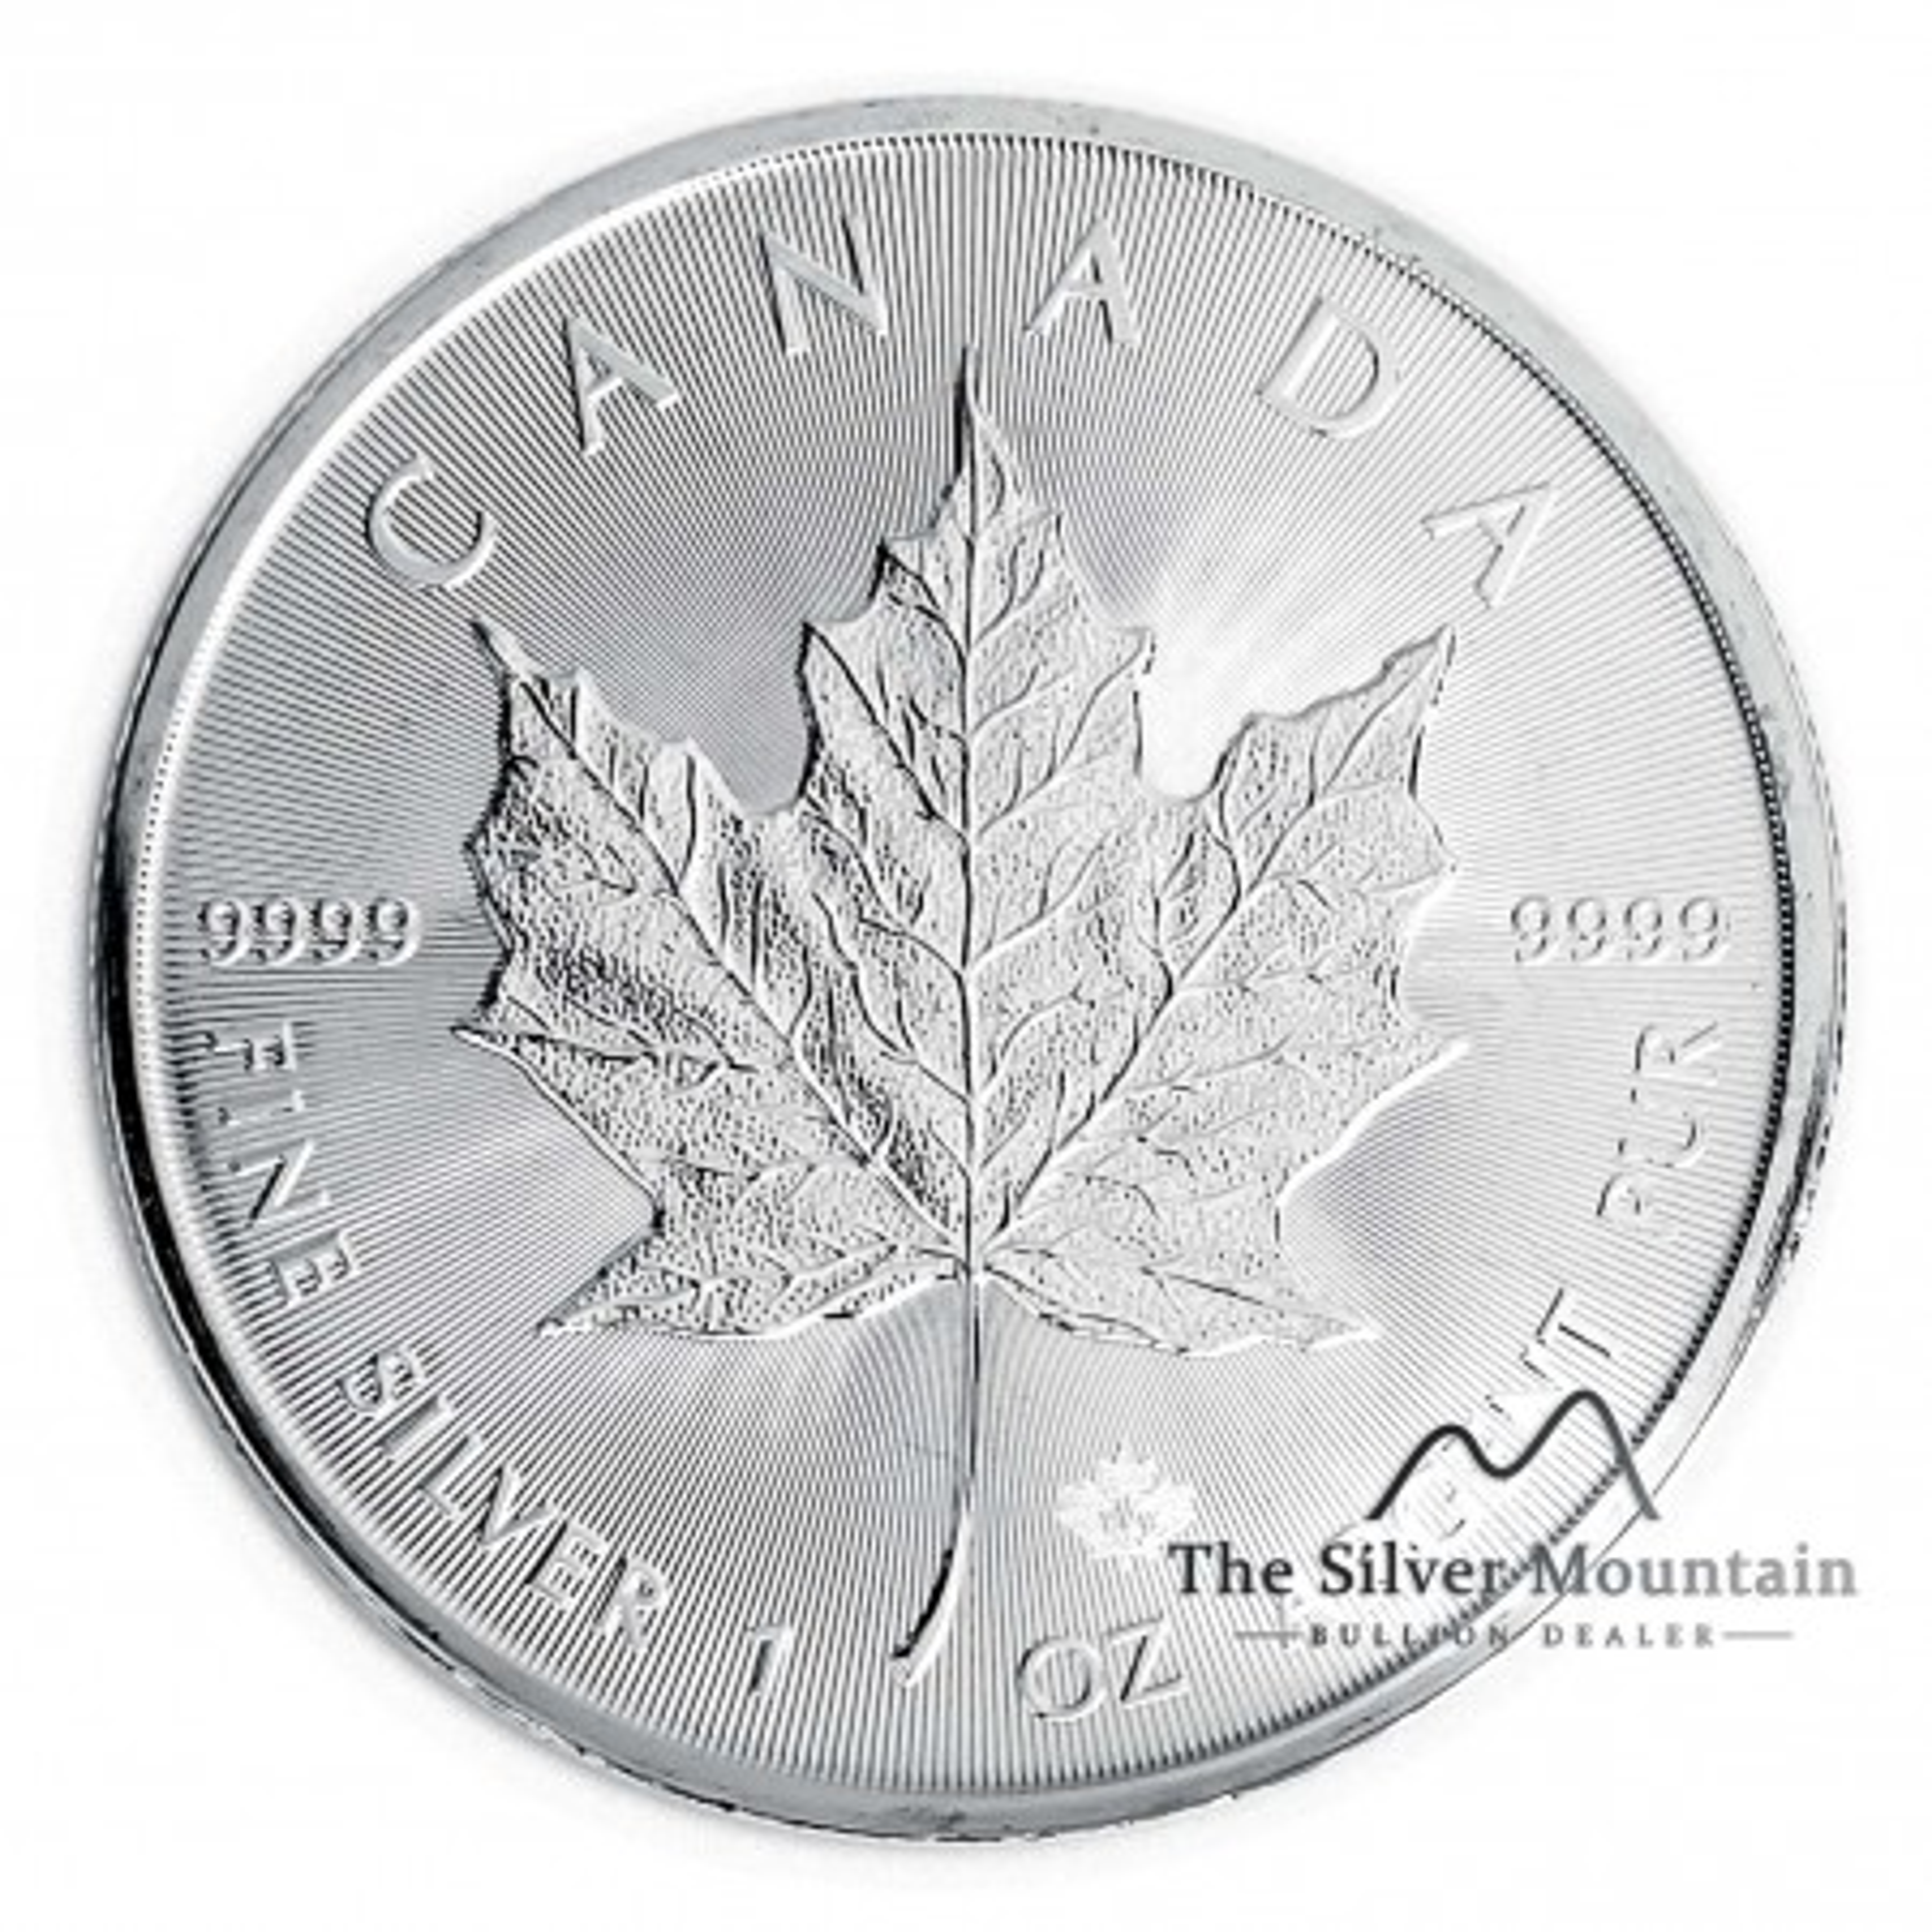 Nieuwe zilveren Maple Leaf munt 2019